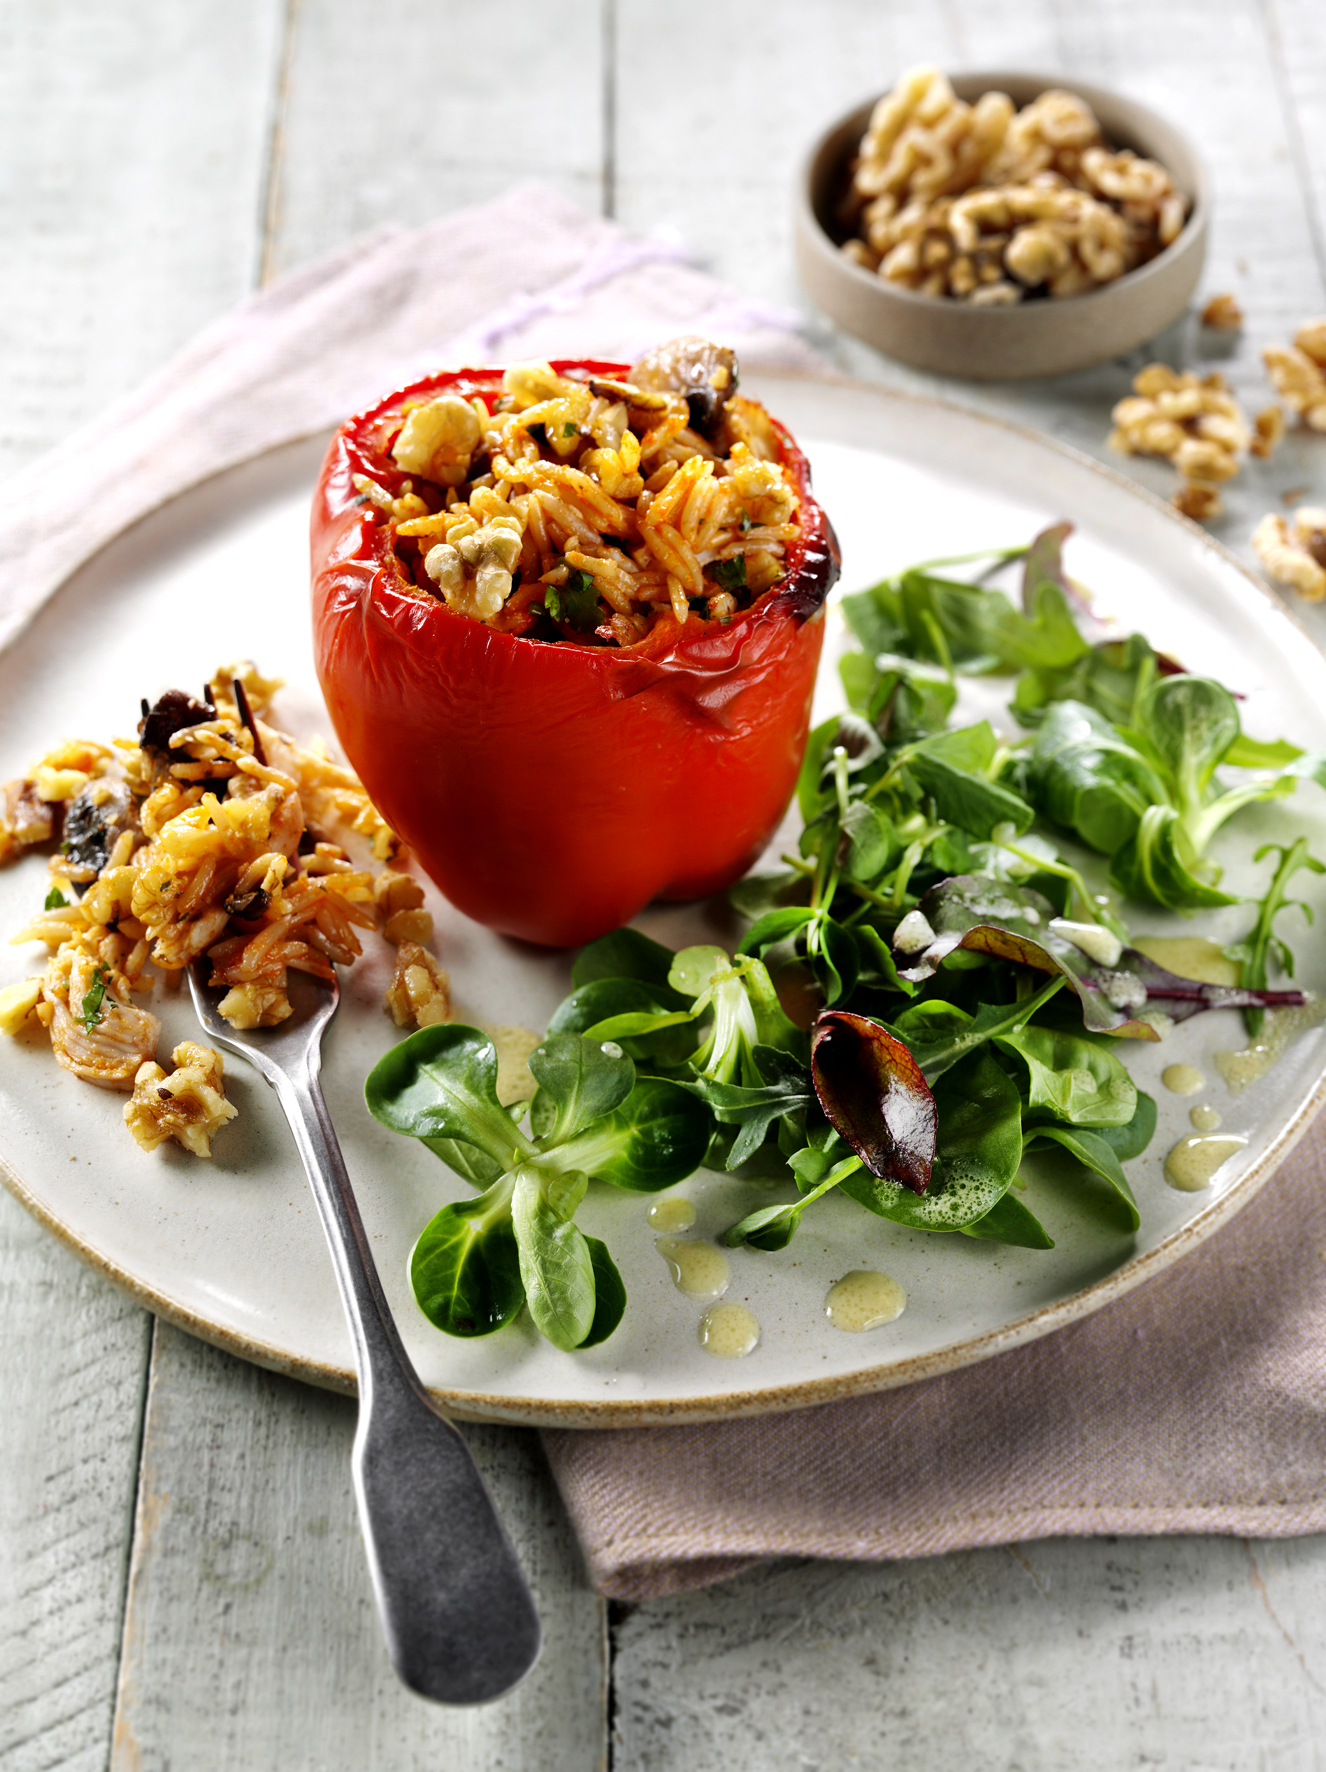 Paprike s orasima idealno jelo